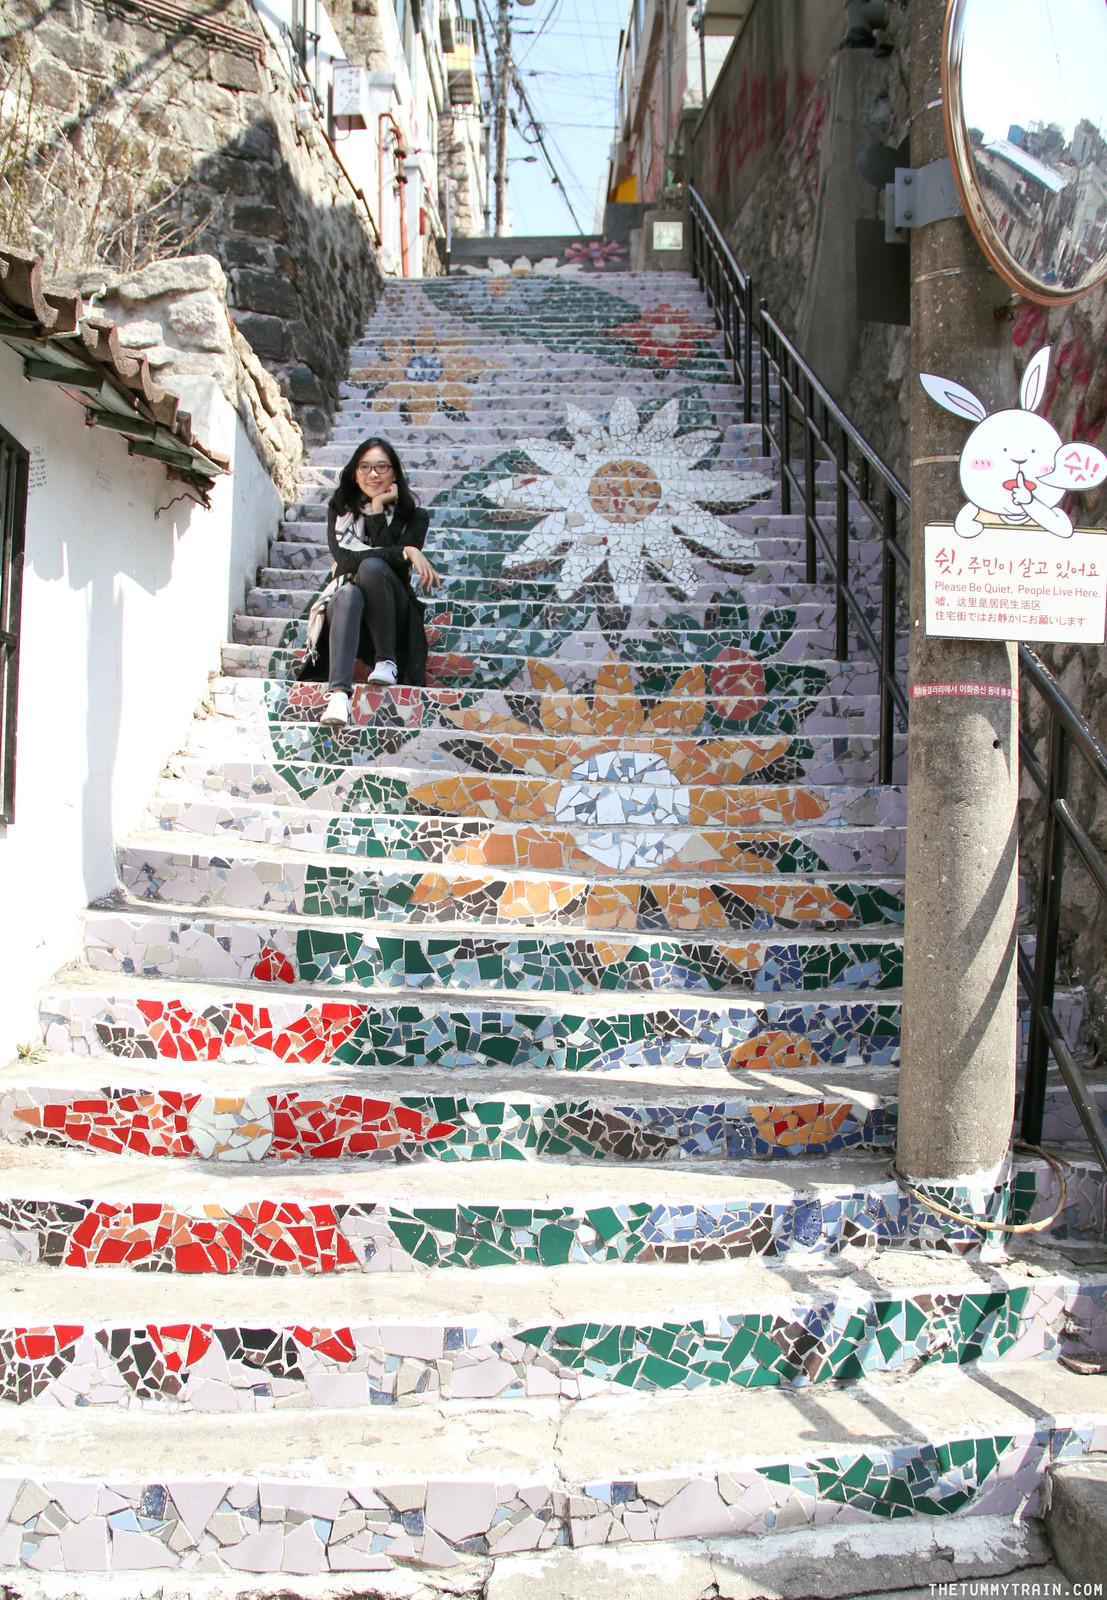 33495548081 c2b8a0943b h - Seoul-ful Spring 2016: A mini exploration of Ihwa Mural Village